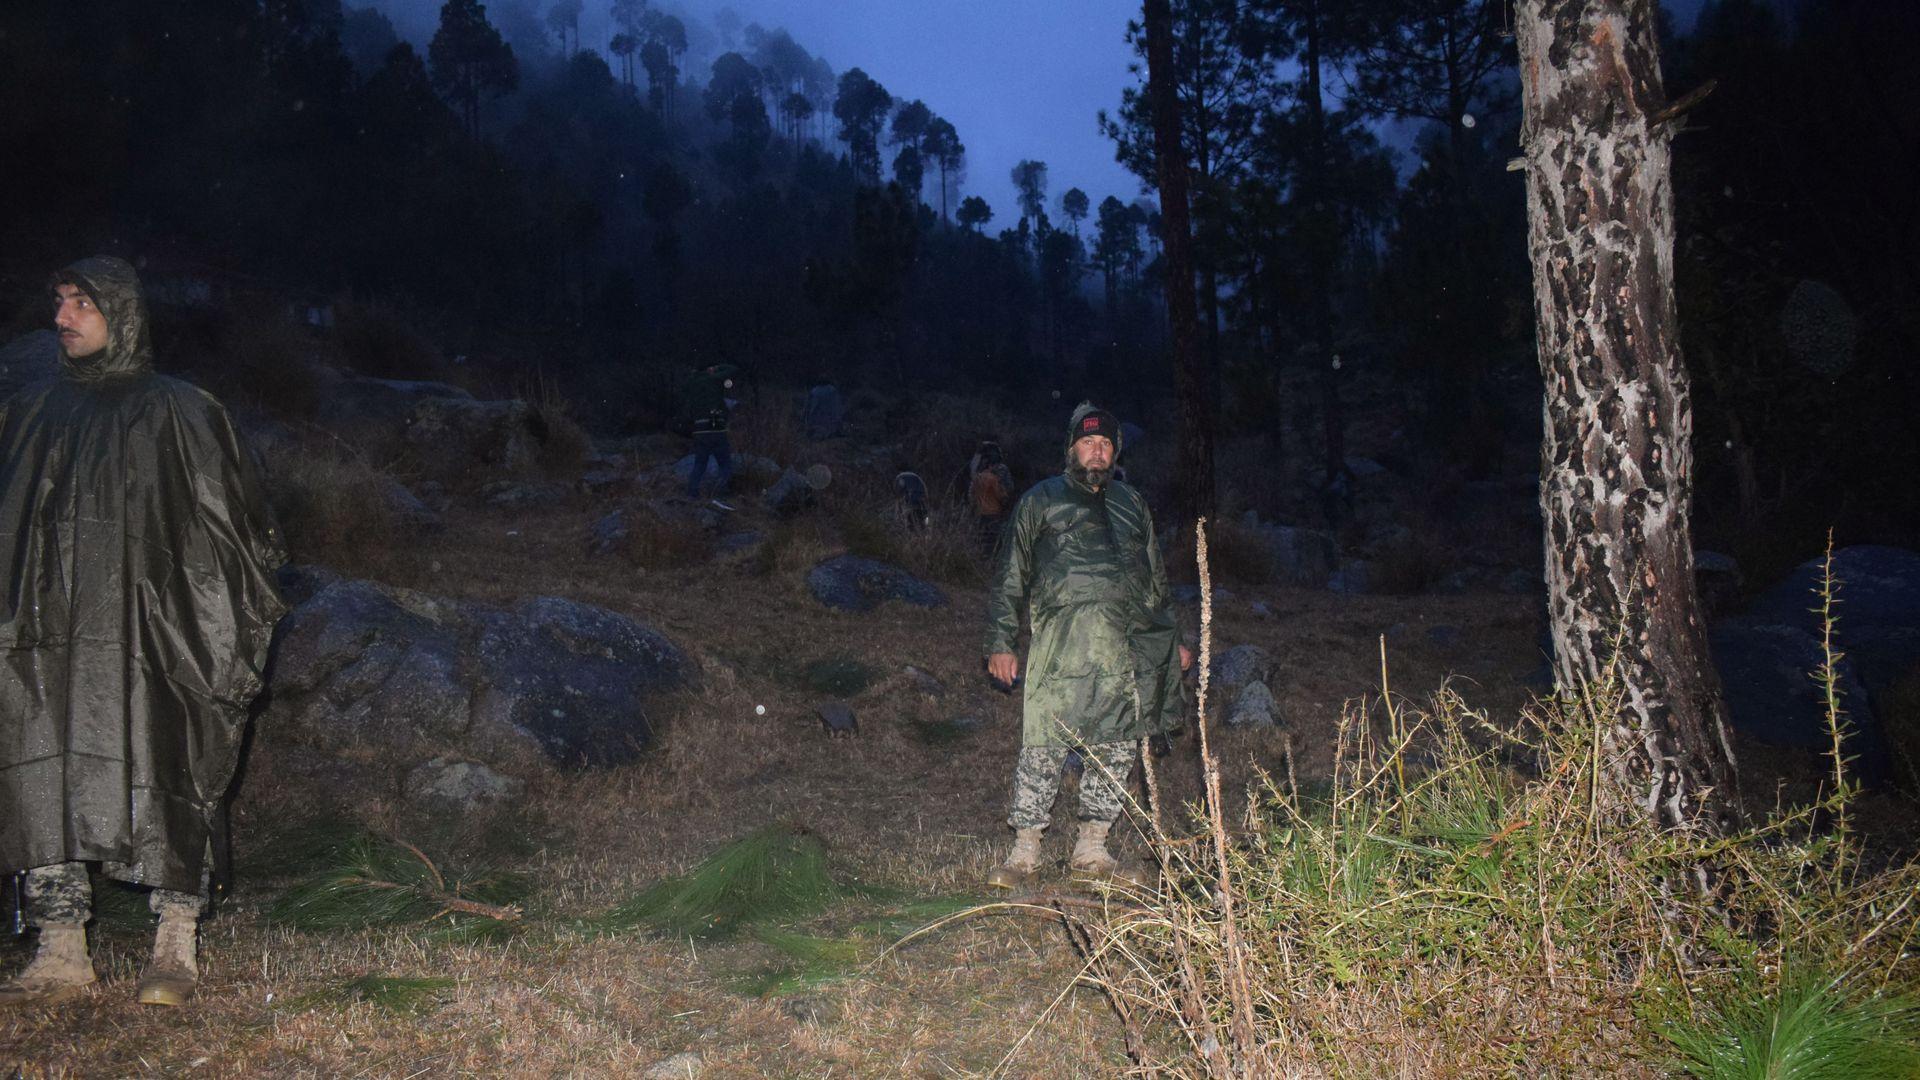 new product eb44d 49c57 India airstrikes inside Pakistan s Kashmir targeting militants